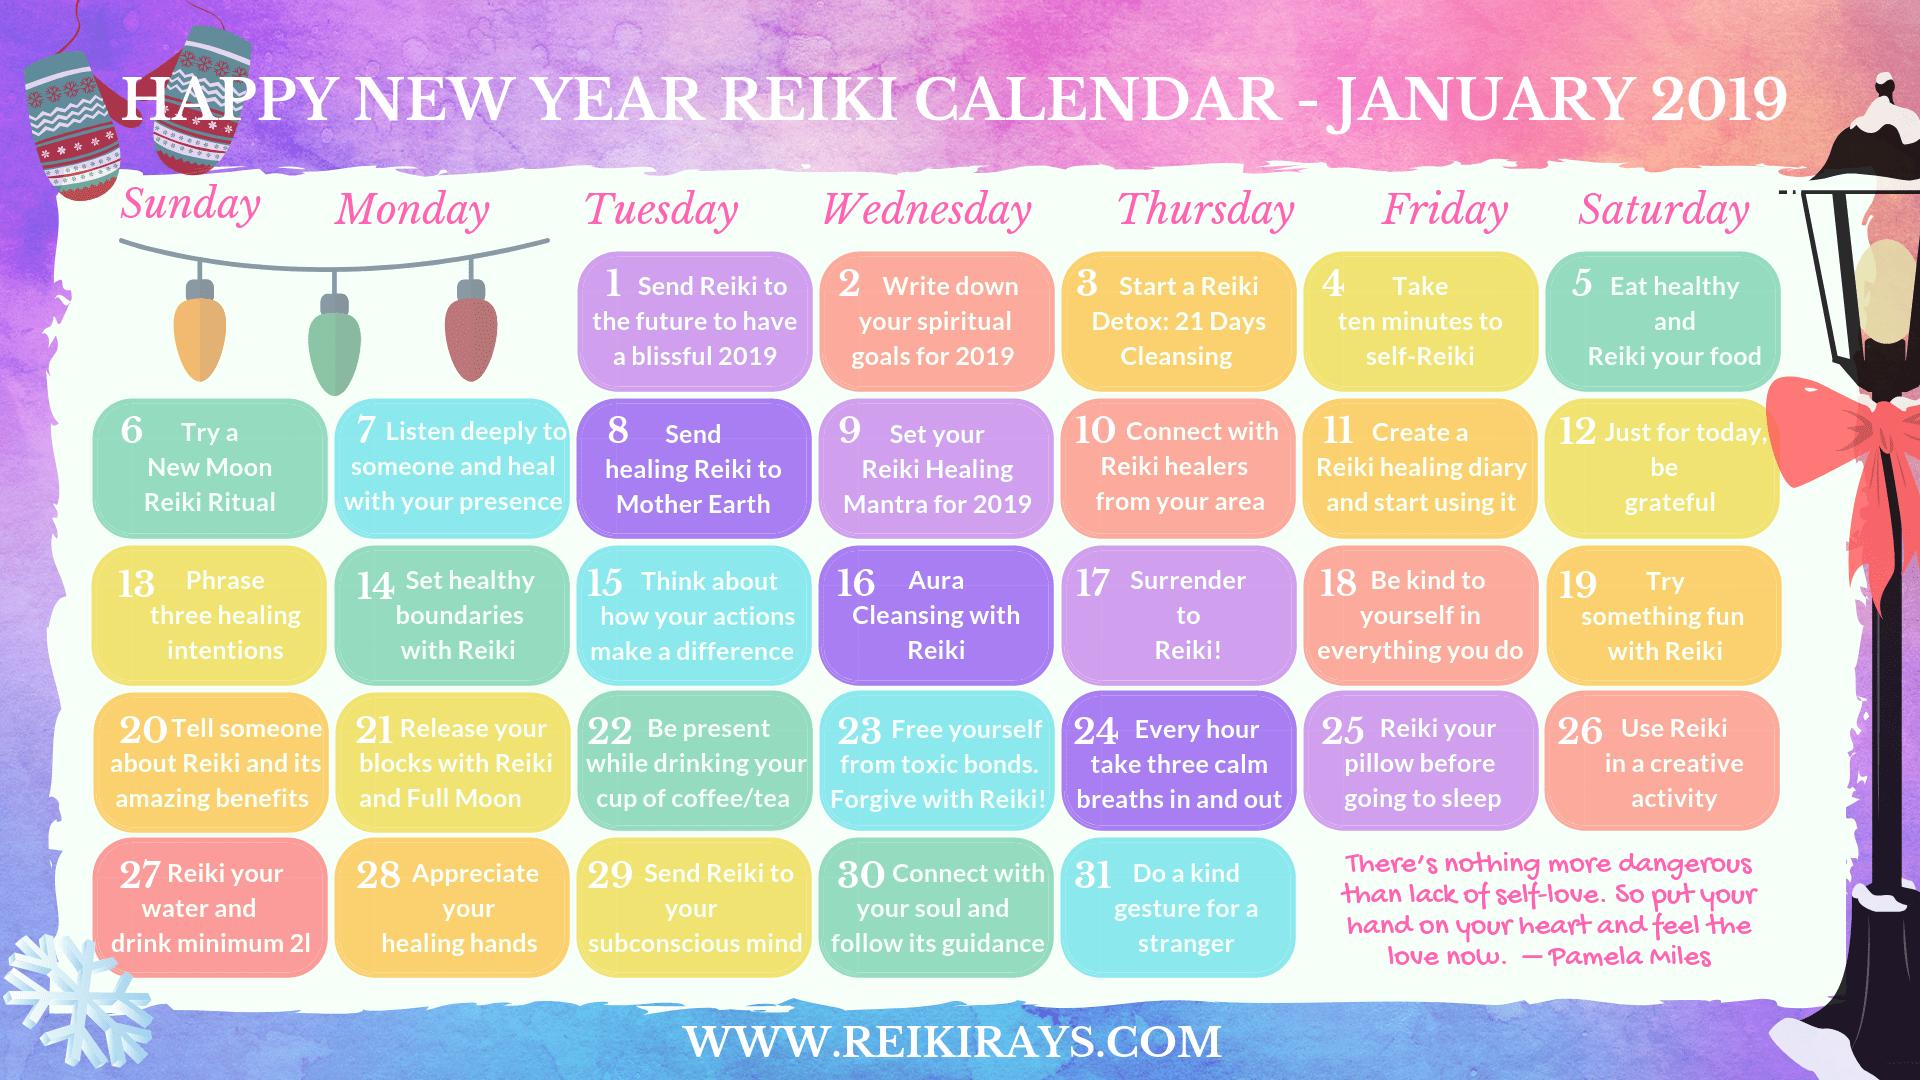 Reiki Calendar - January 2019